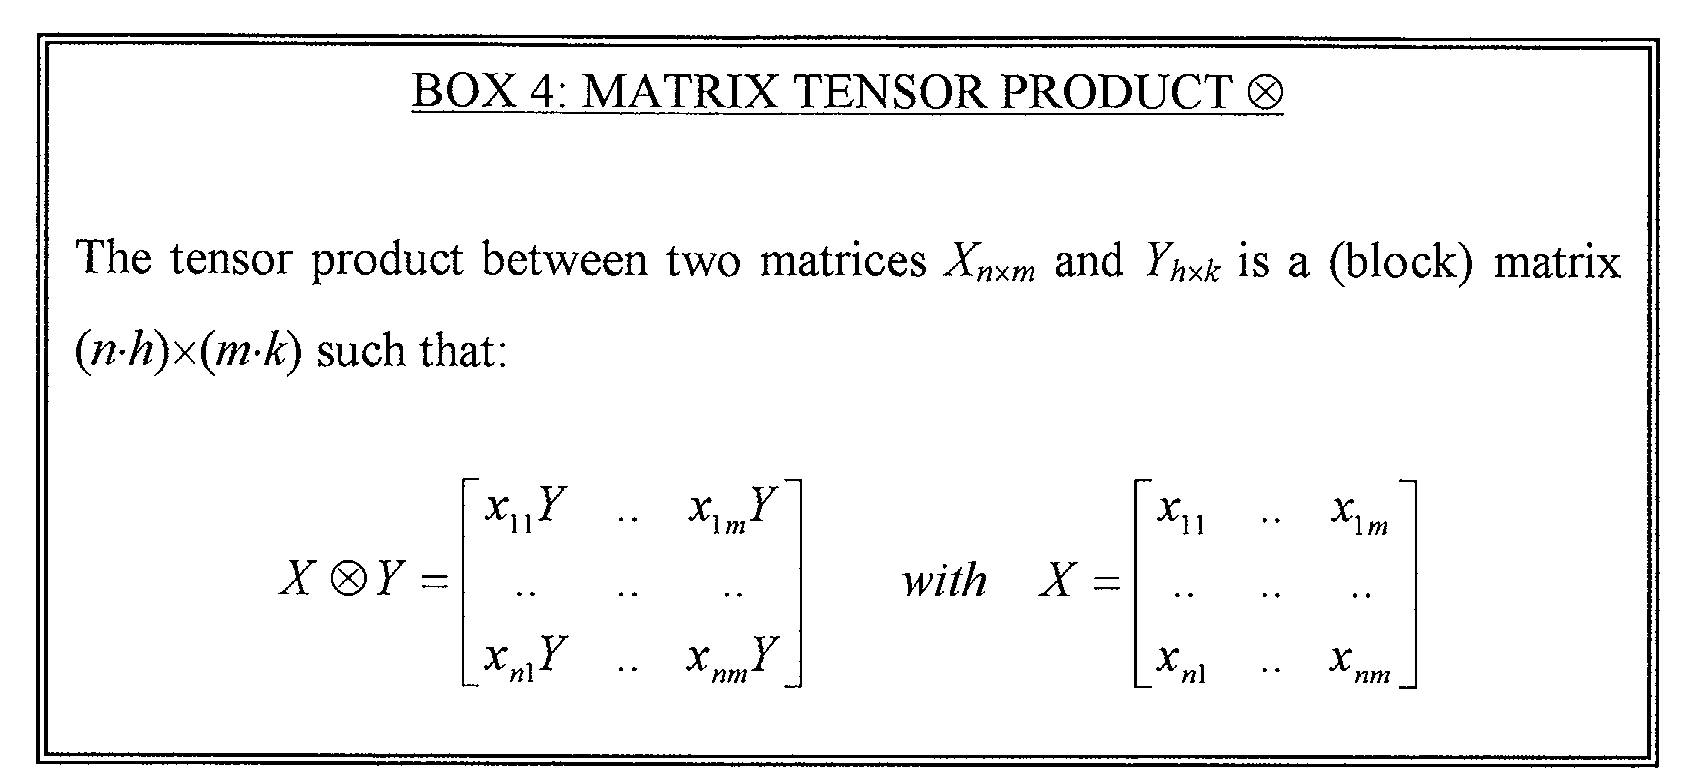 Figure 00070002 example matrix tensor product